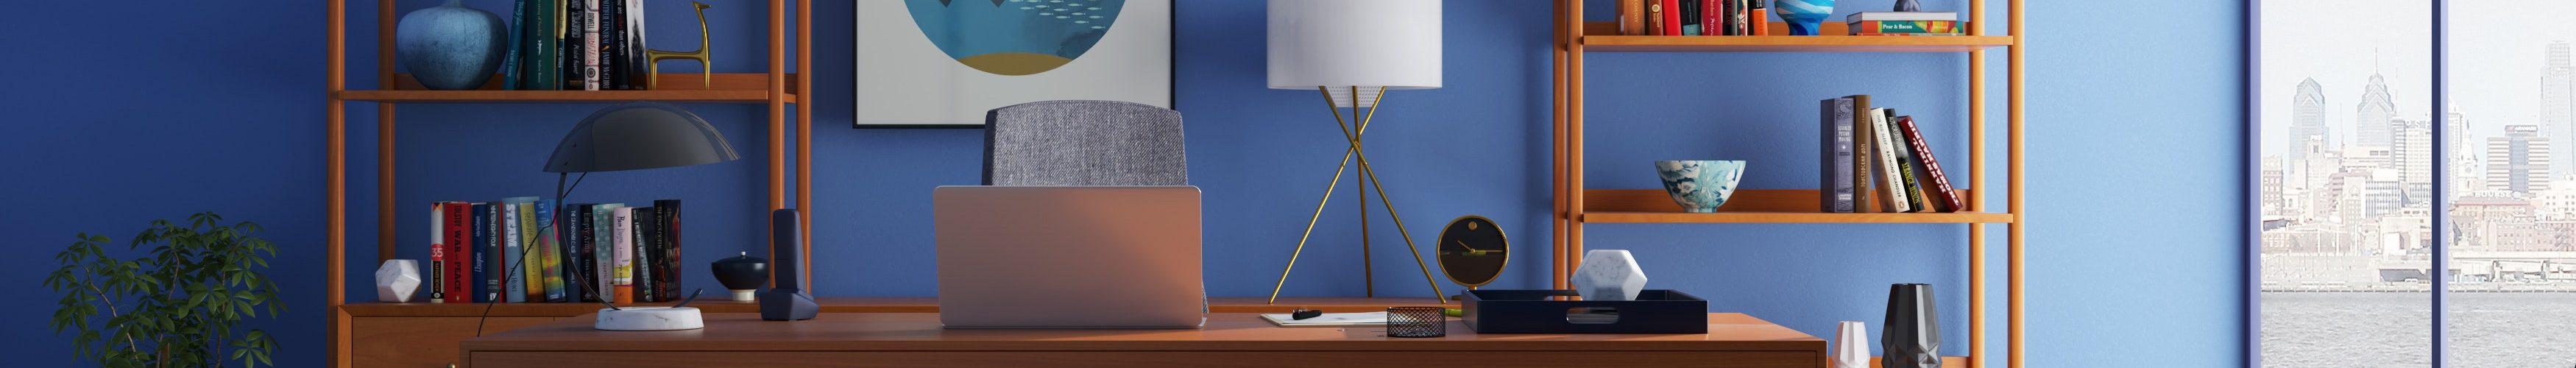 smart-home-domotica